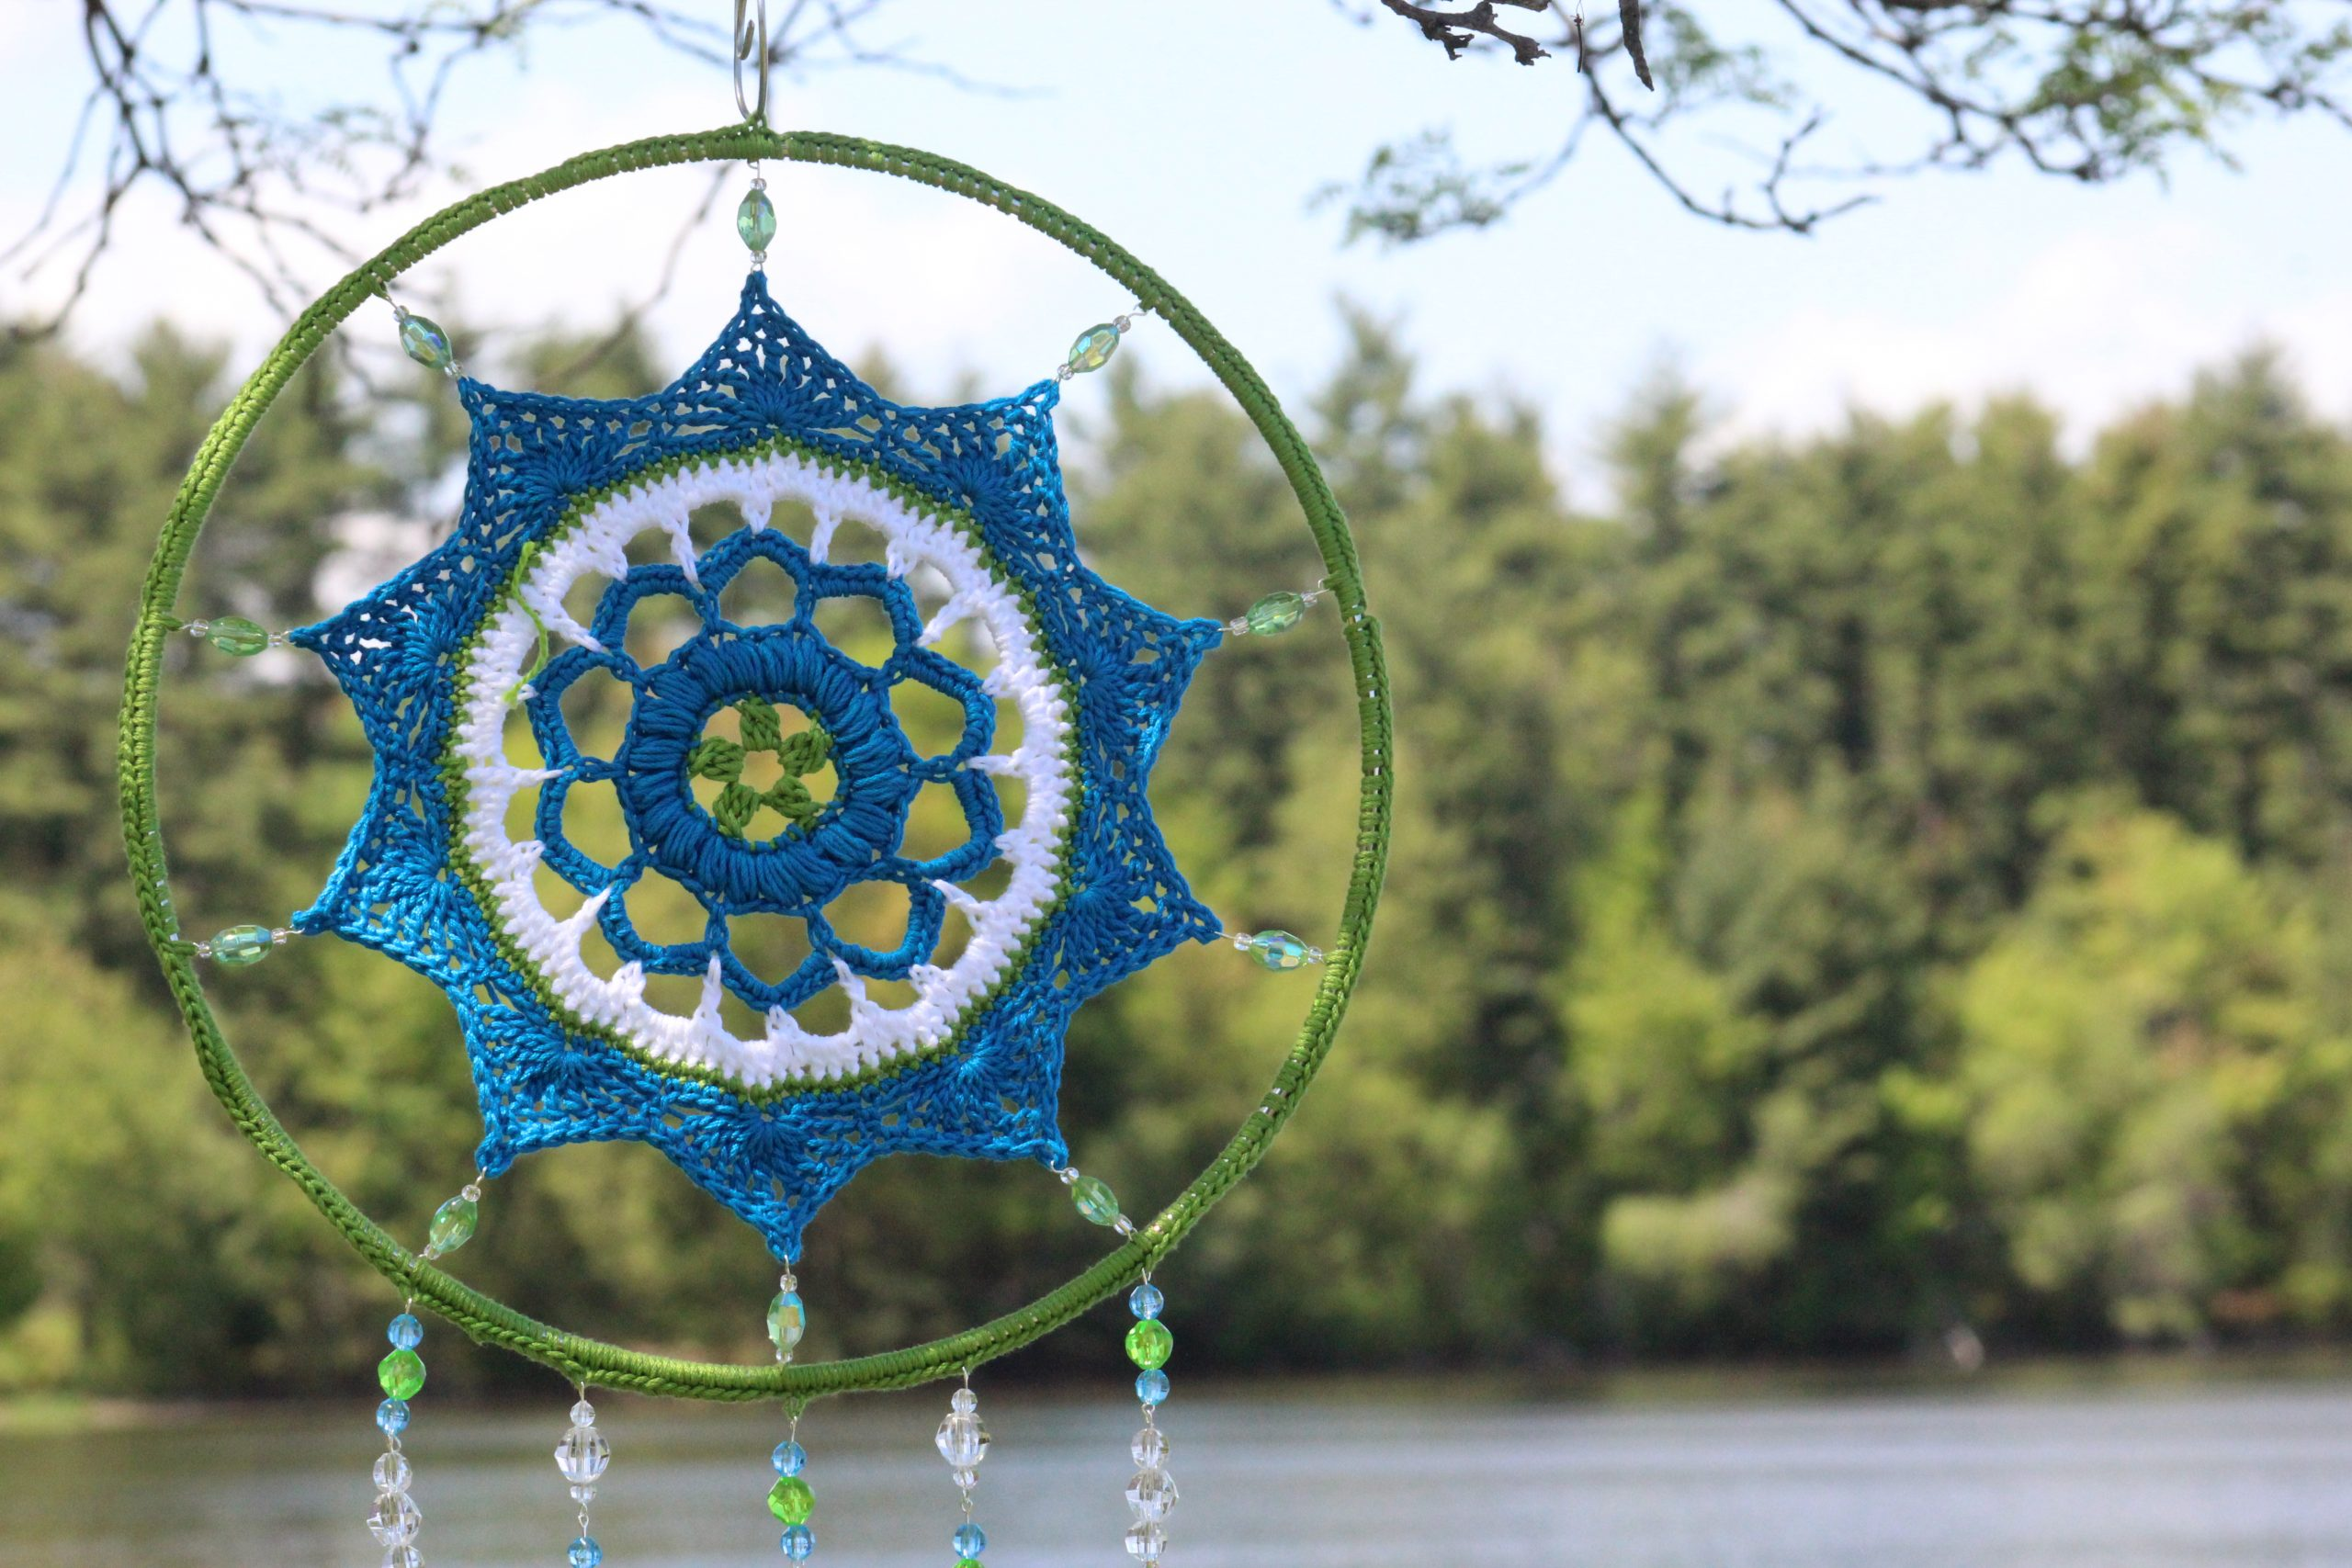 crochet mandala stretched across a ring